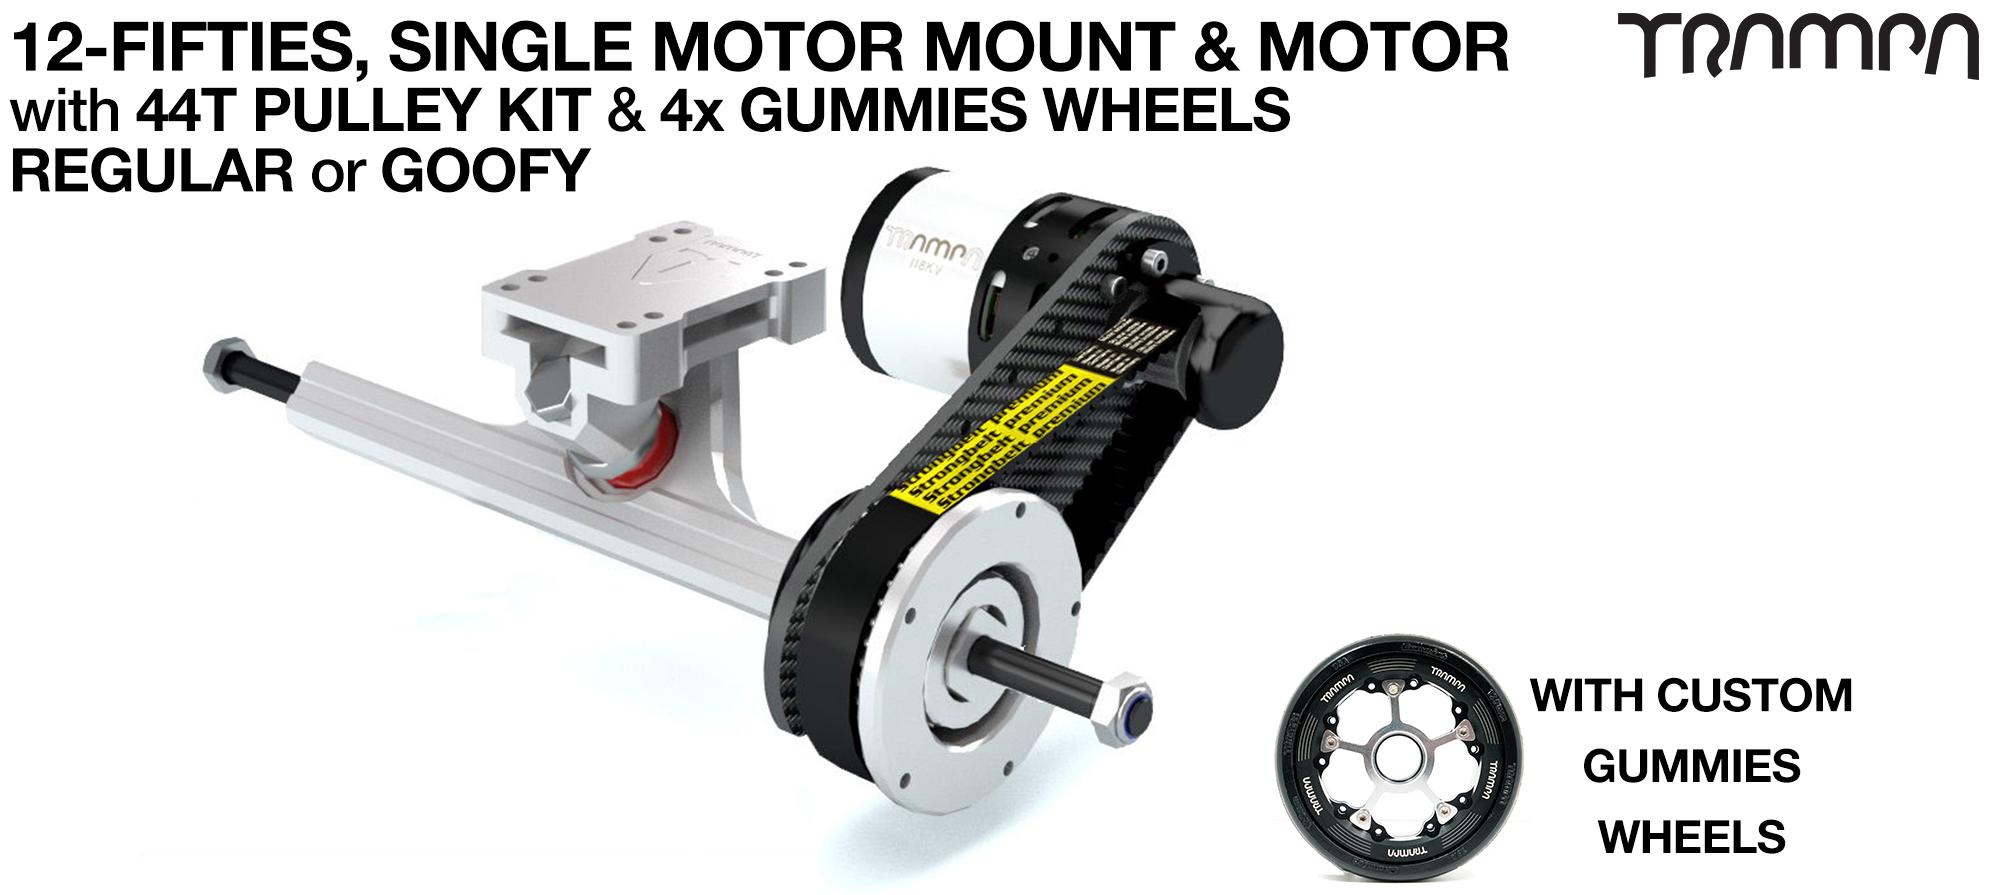 SINGLE Original 12FiFties Motor mount & 44 Tooth Pulley Kit with MOTOR & 2x 12FiFties Trucks & 4x Gummies Wheels